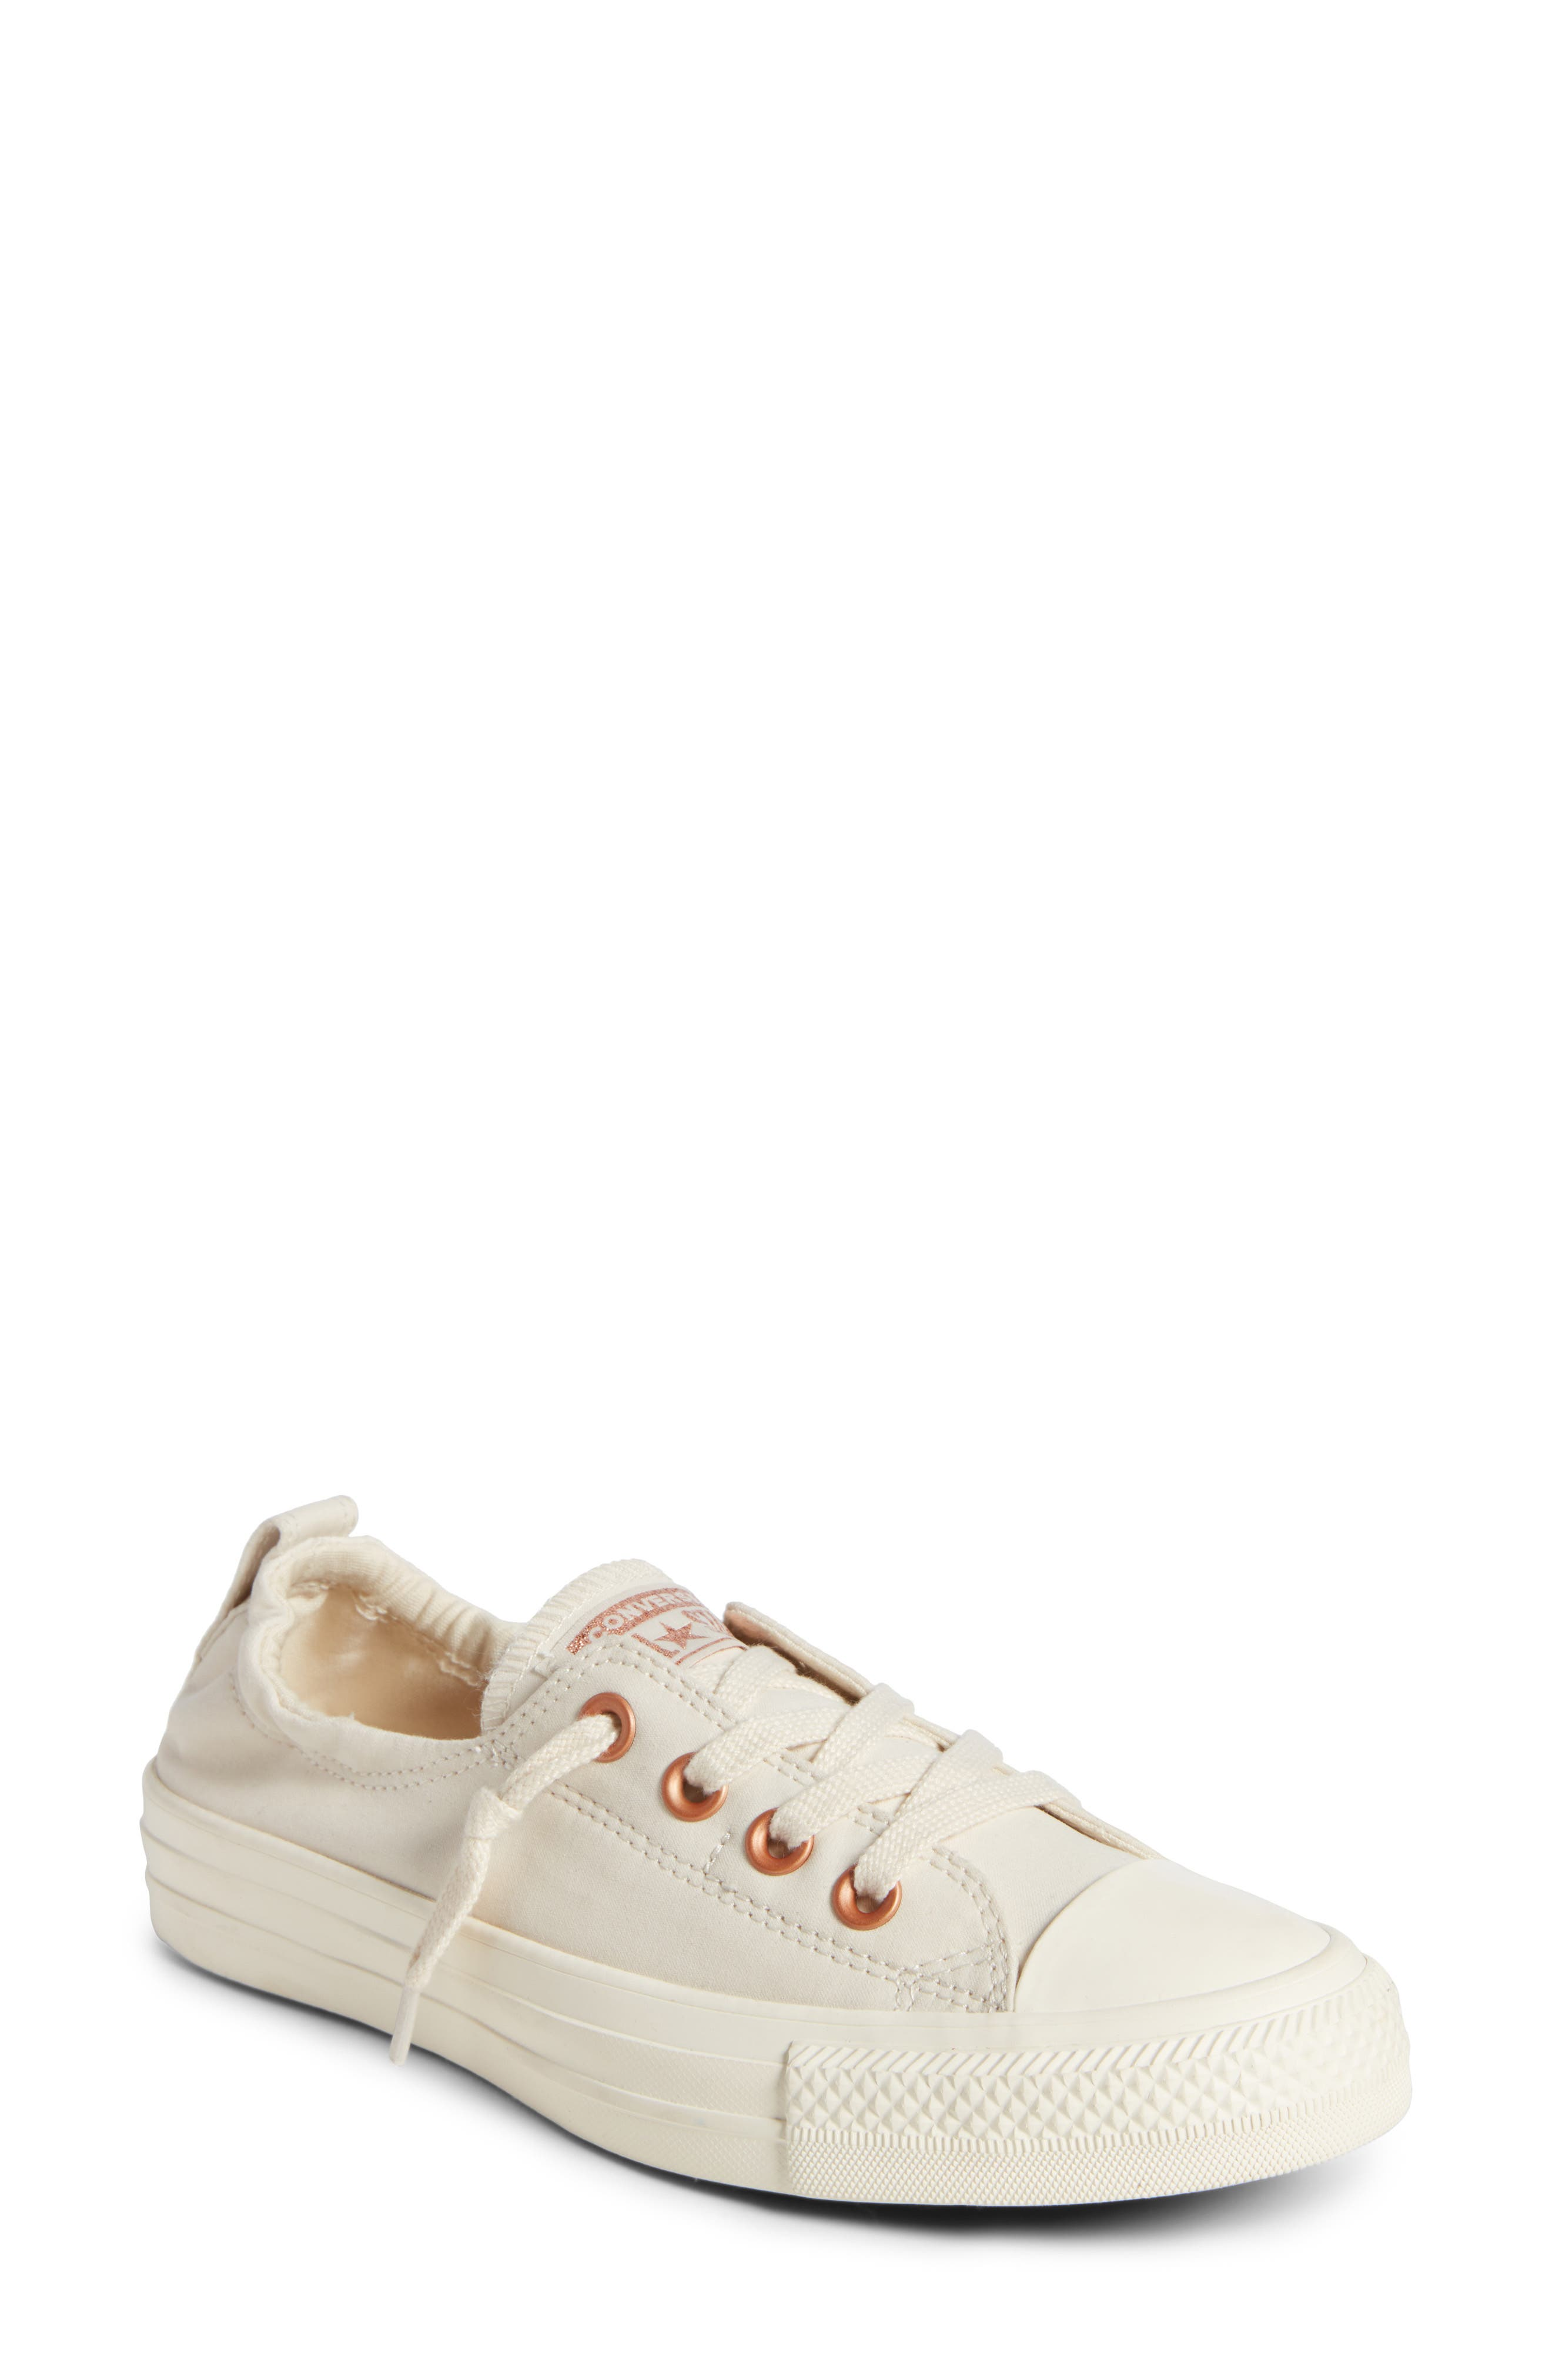 Chuck Taylor<sup>®</sup> 'Shoreline' Sneaker,                             Main thumbnail 1, color,                             Light Twine